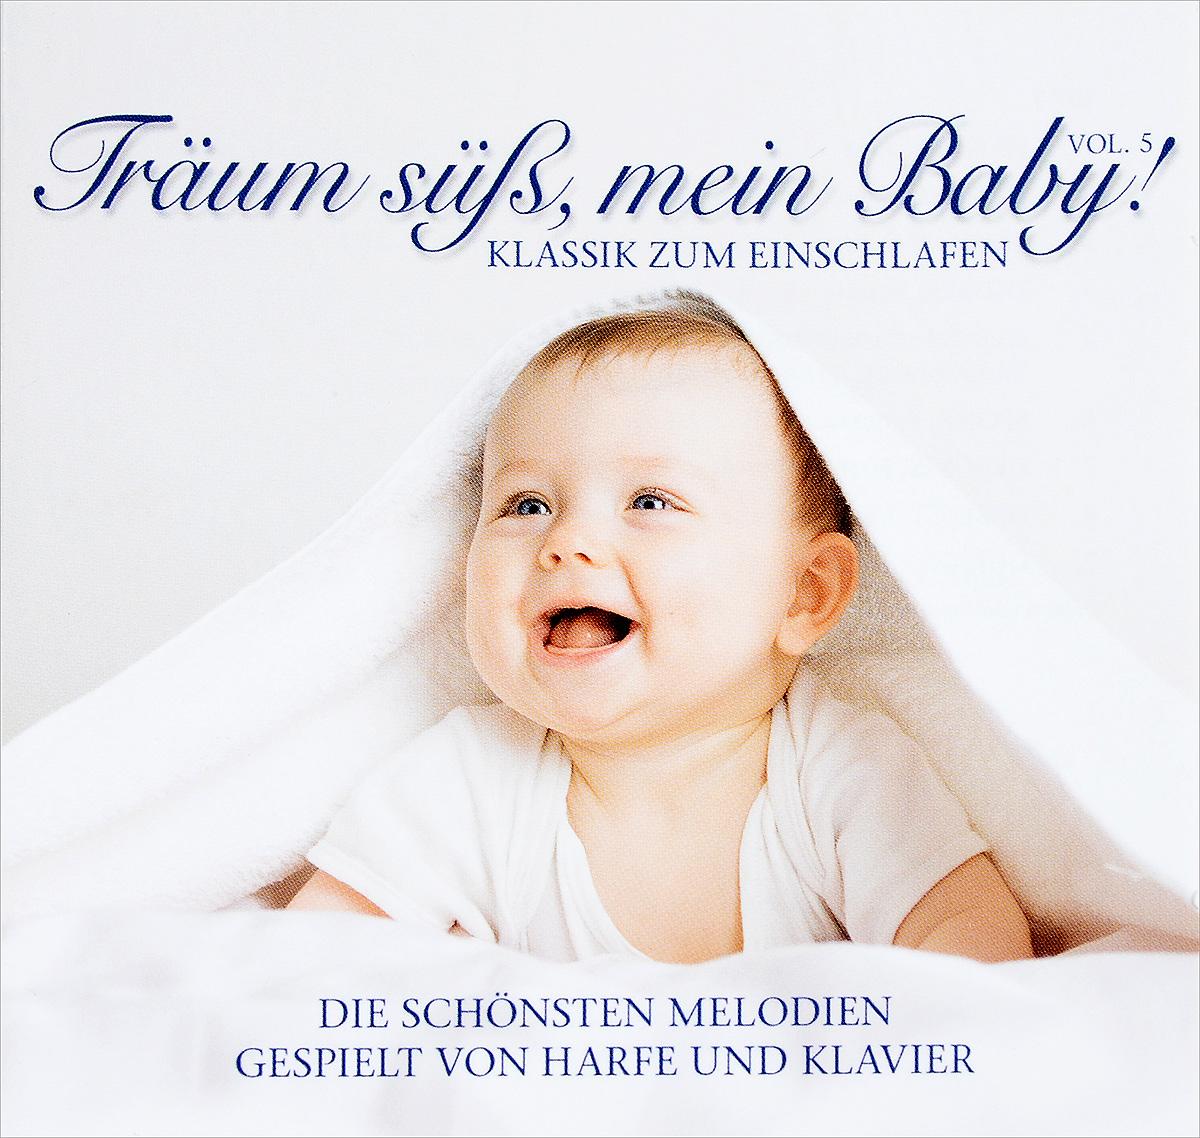 Фото - Traum SuB, Mein Baby! Klassik Zum Einschlafen. Vol. 5 (2 CD) klassik highlights in classic 4 cd